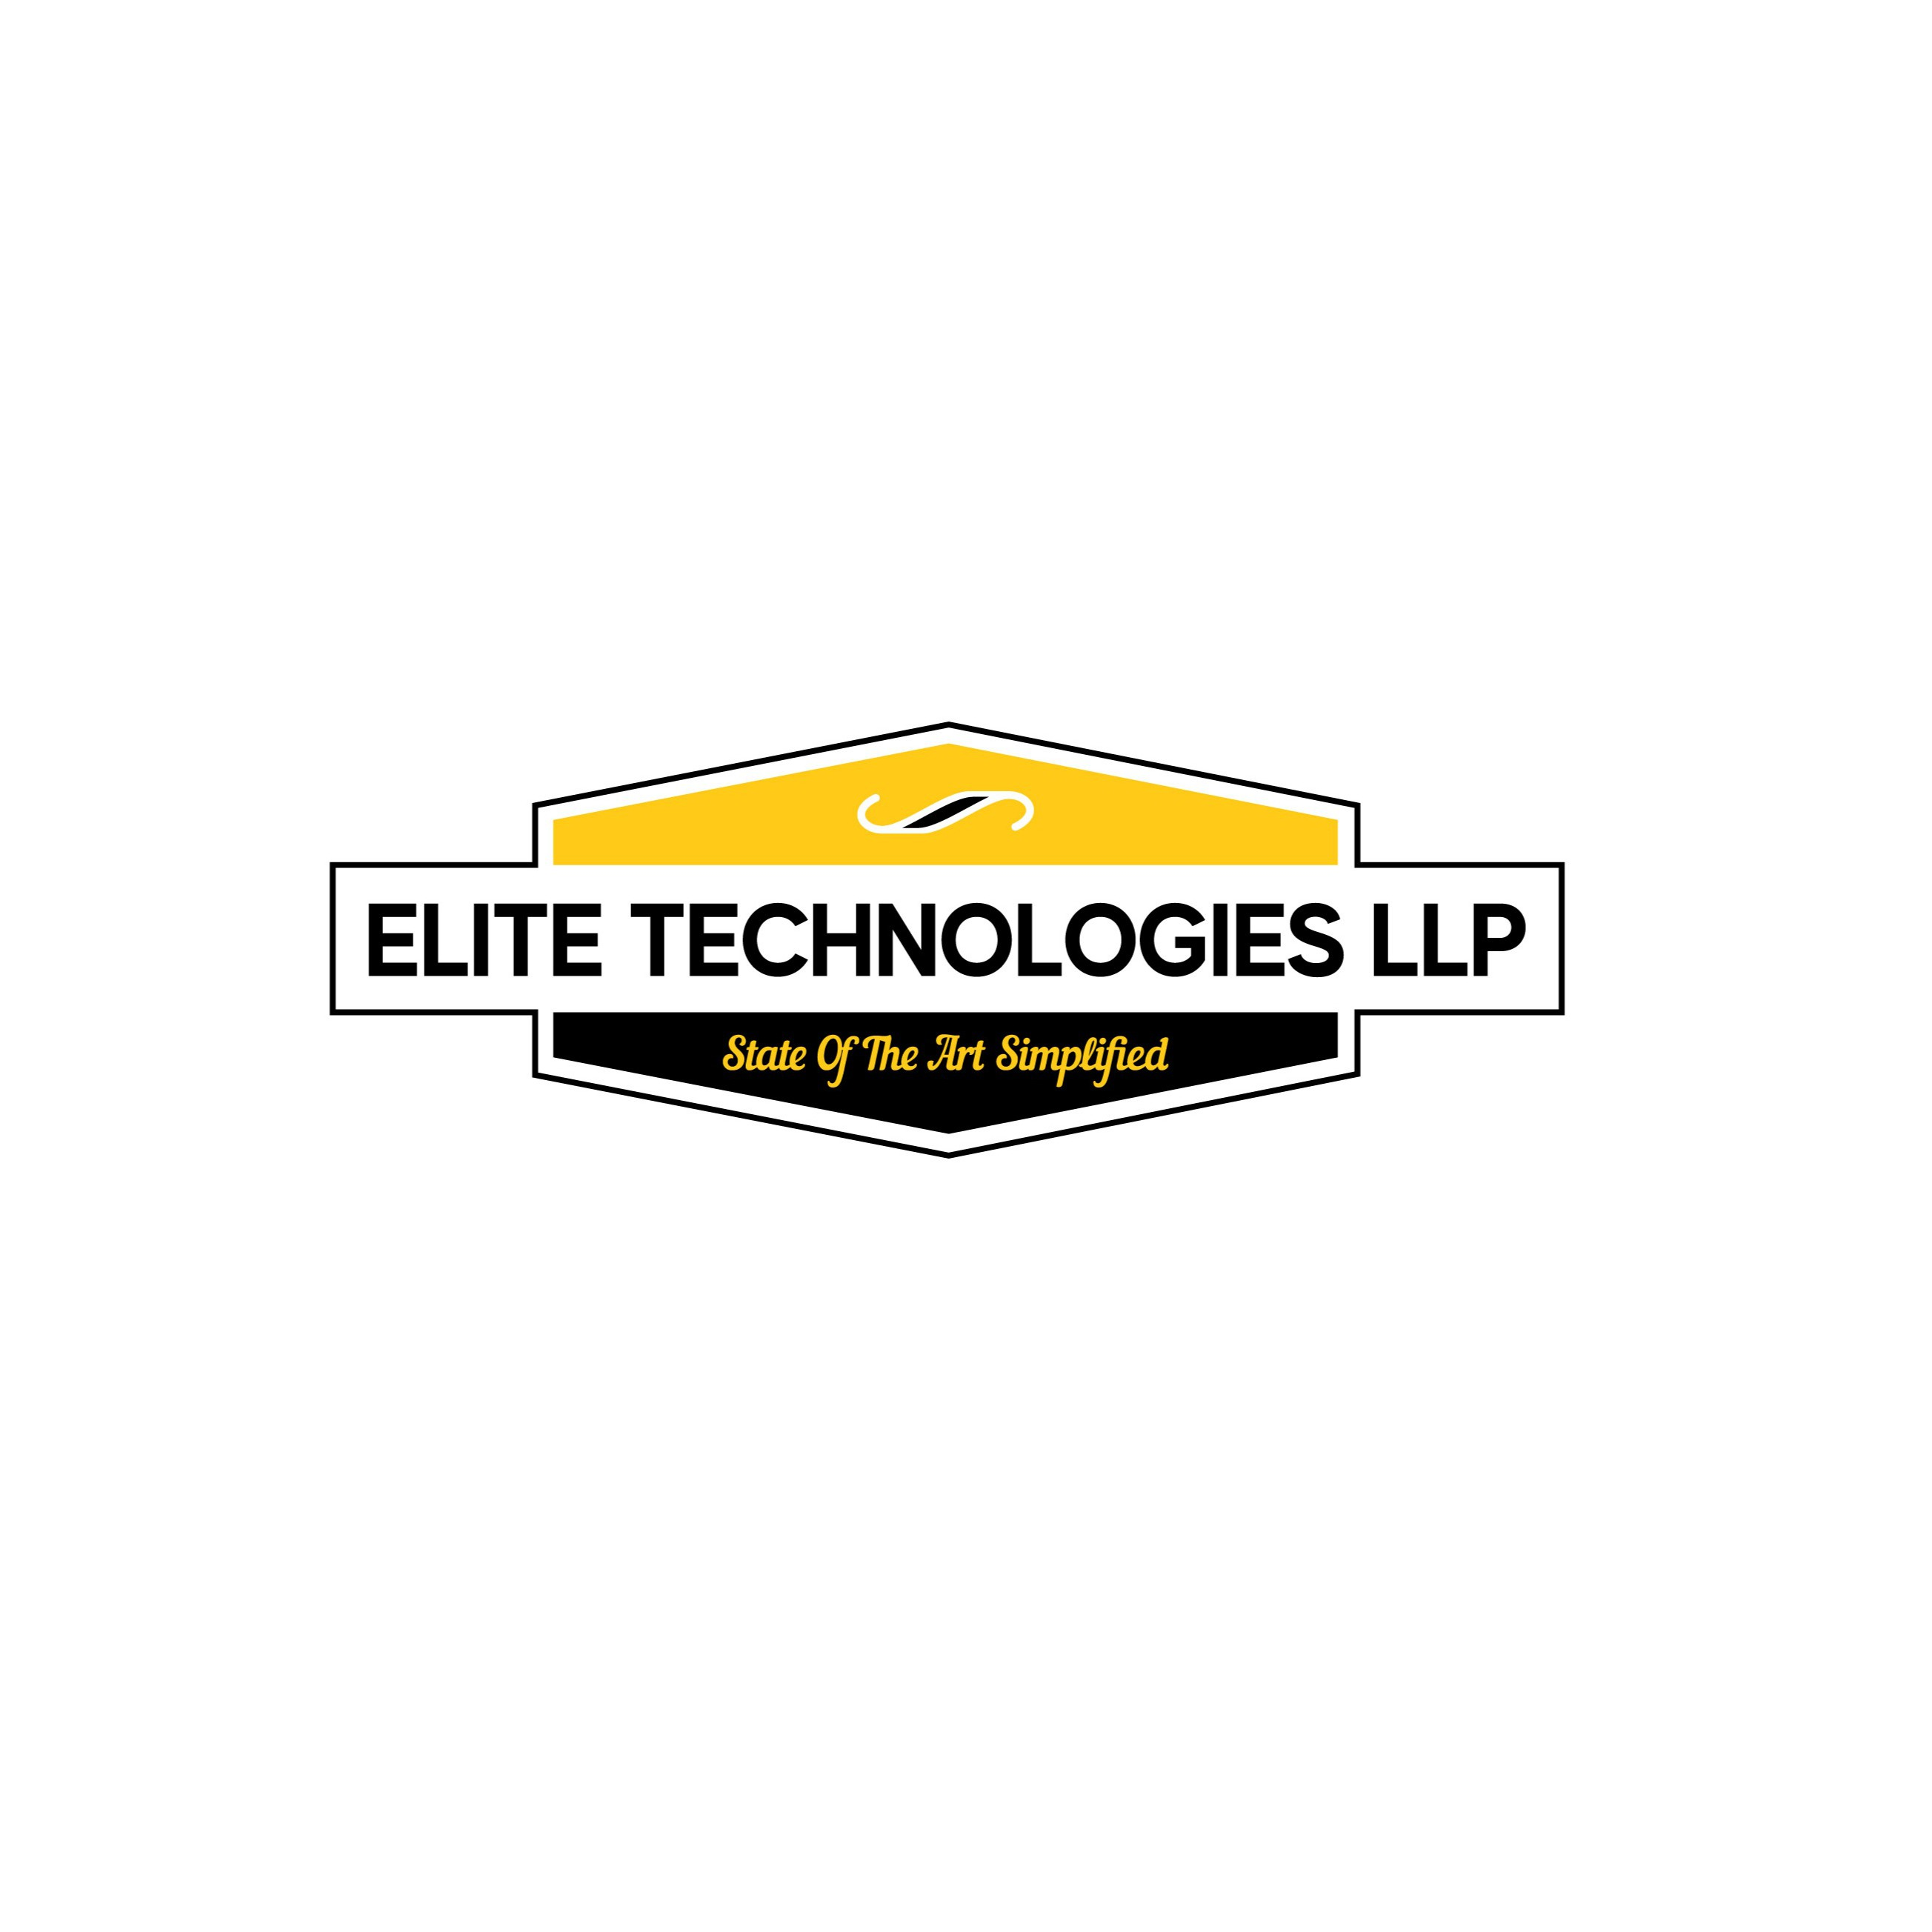 Elite Technologies LLP